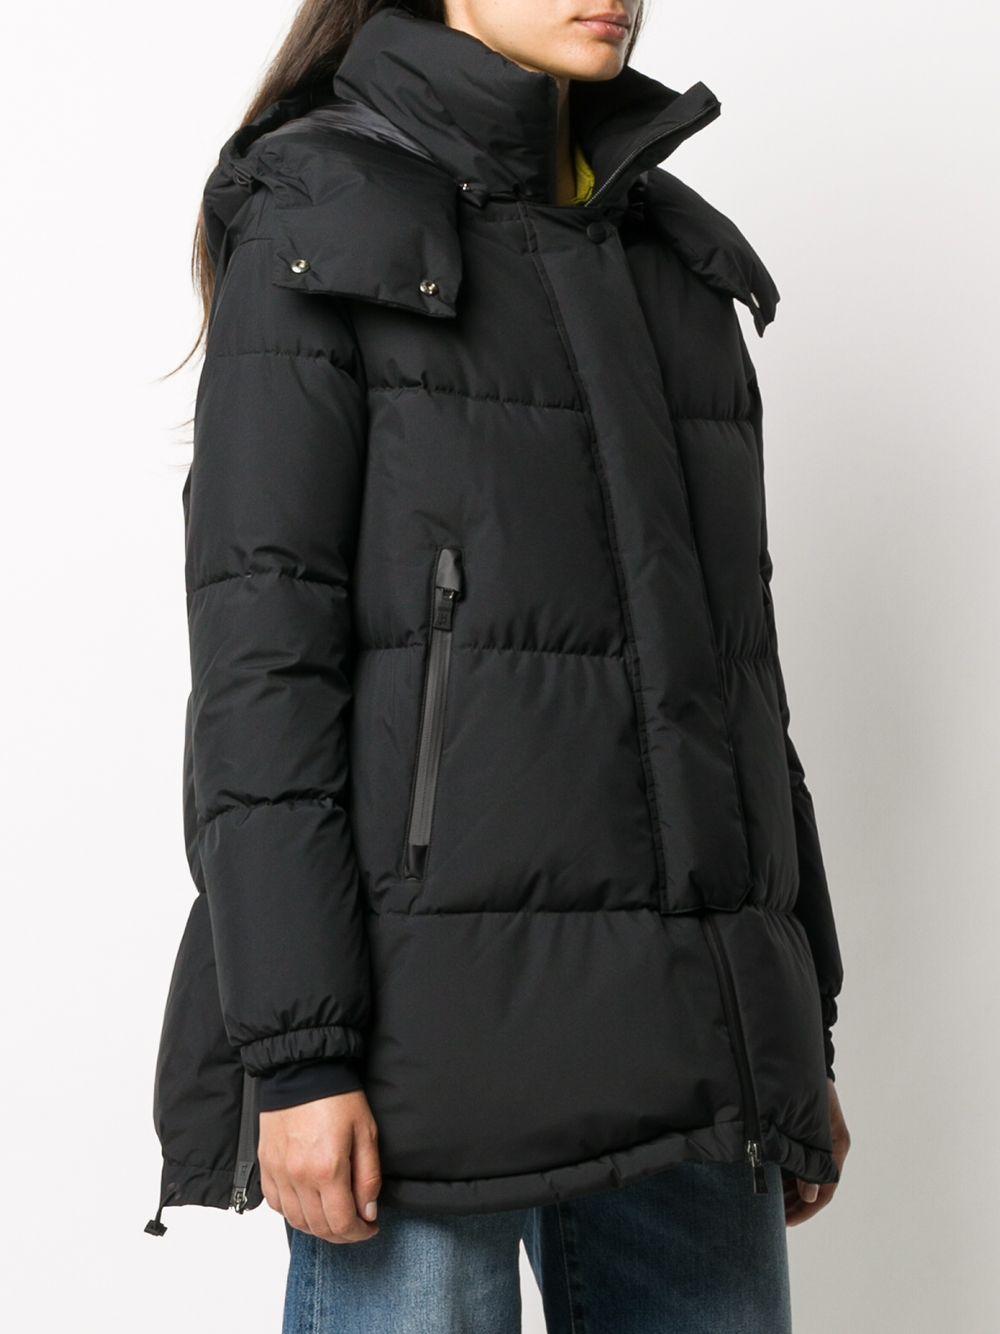 Black oversized puffer jacket featuring funnel neck HERNO |  | PI128DL-111069300